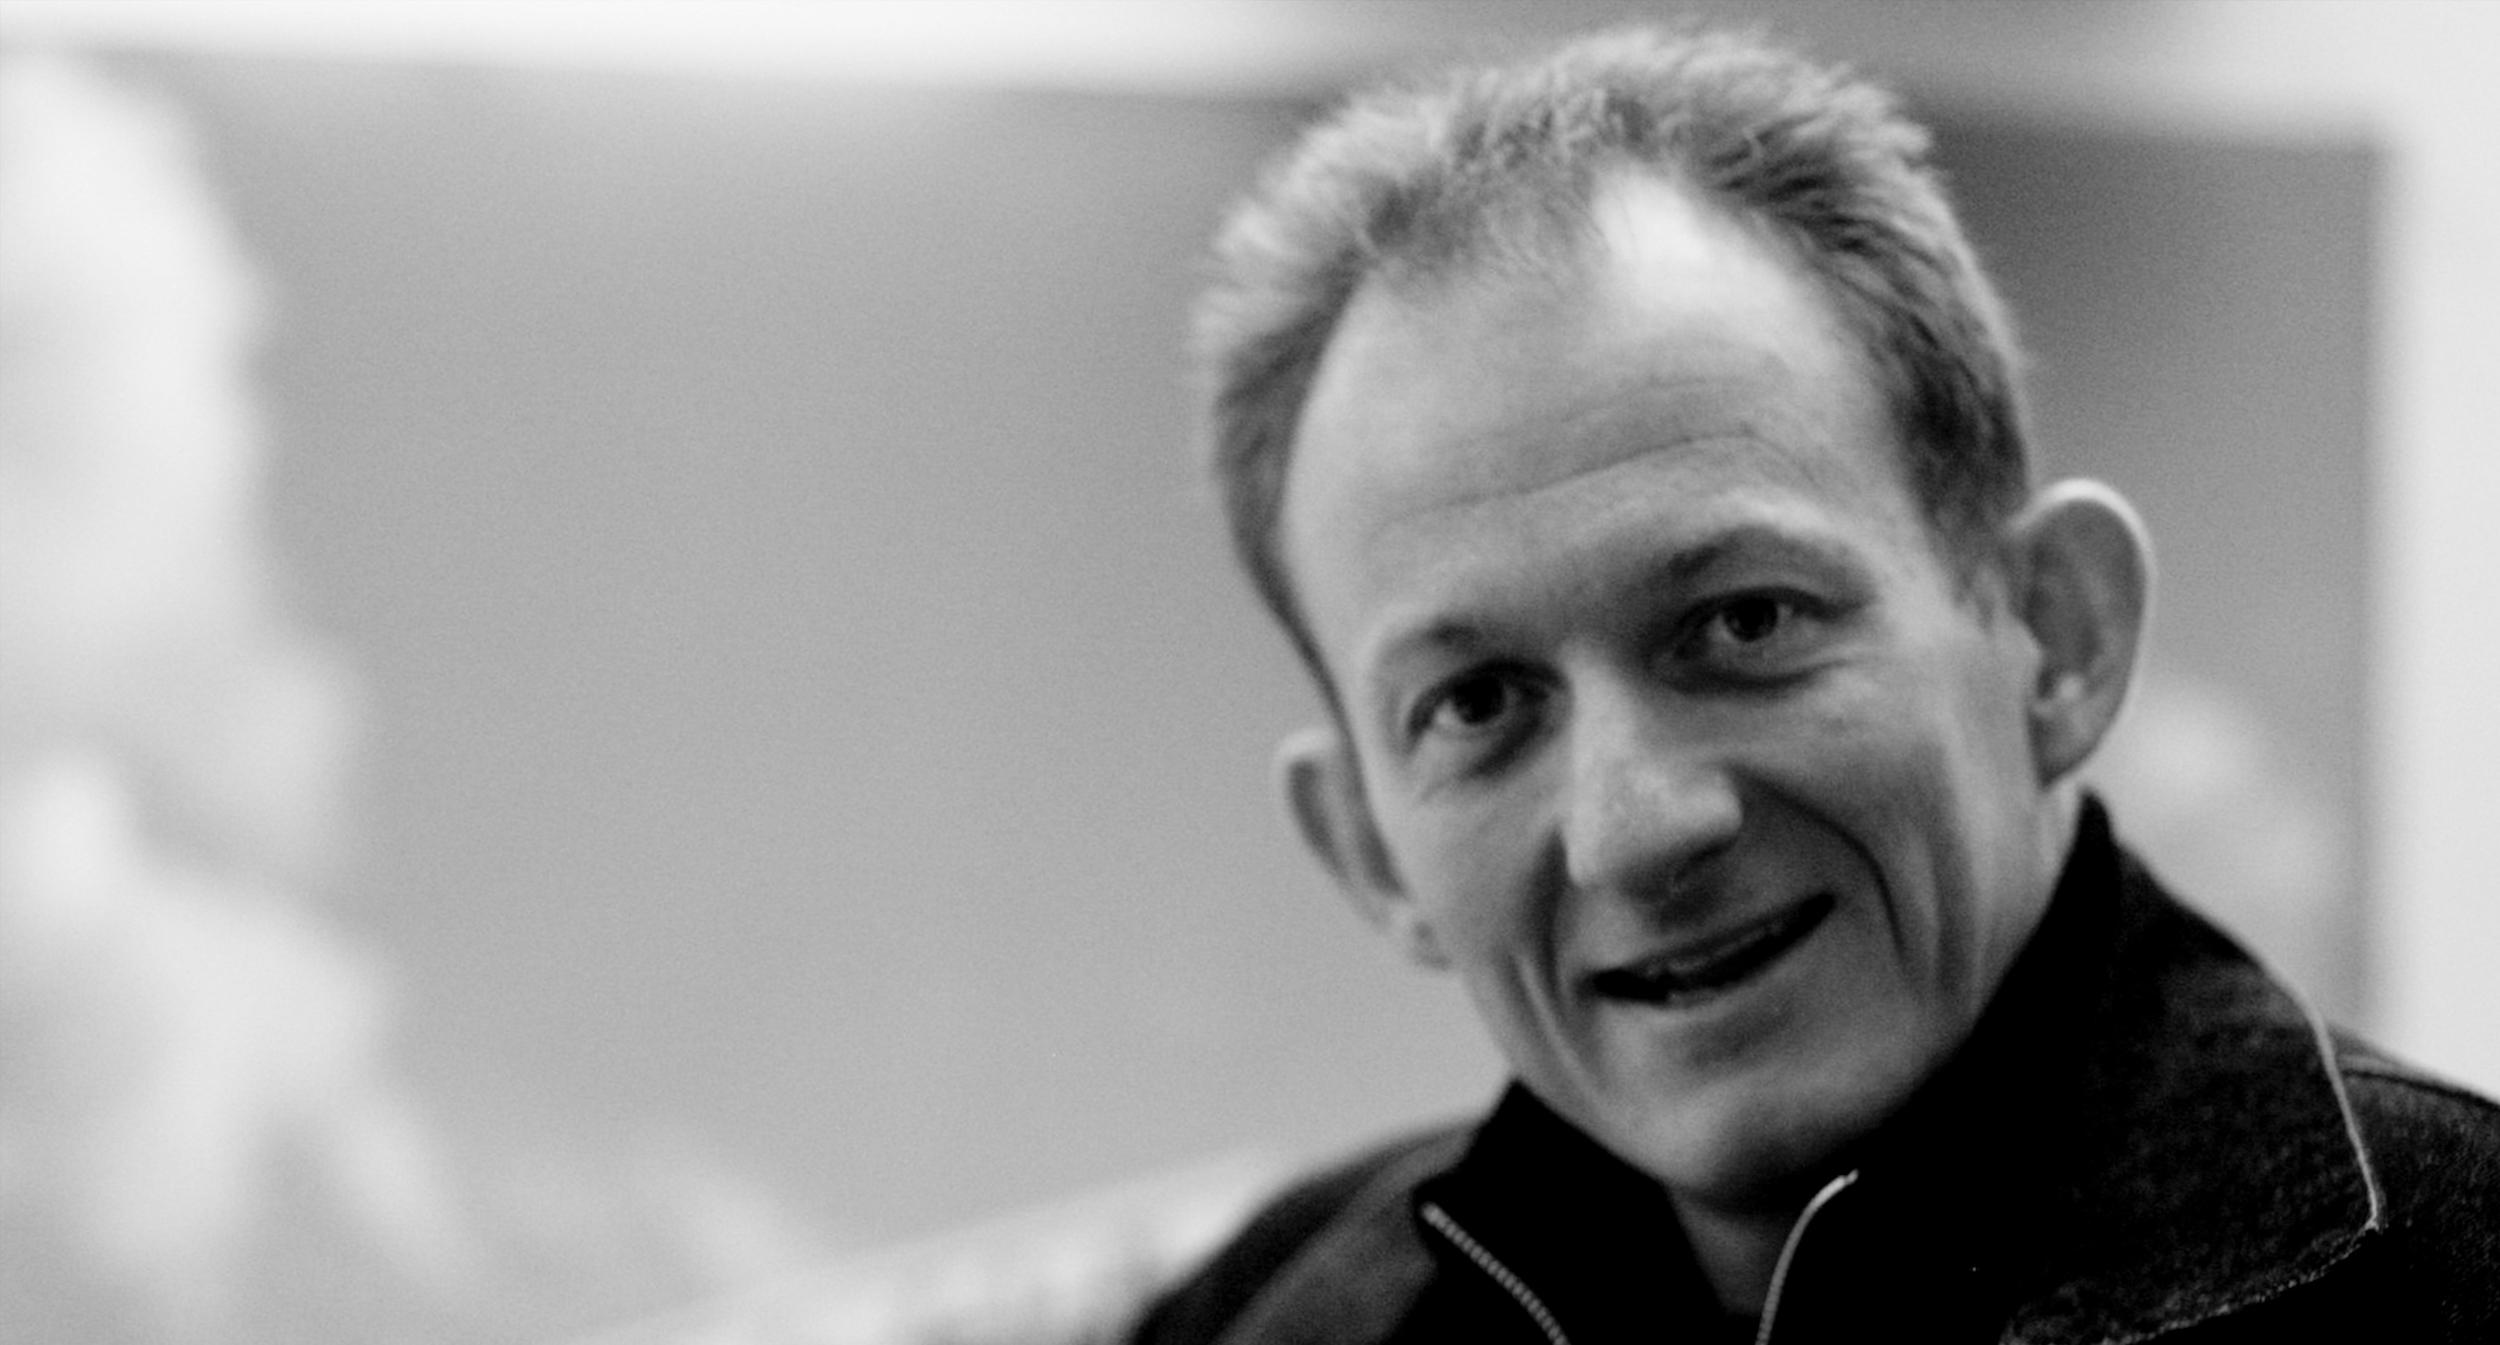 Torben Lindquist partner, constructing architect mak +45 2485 5079               email